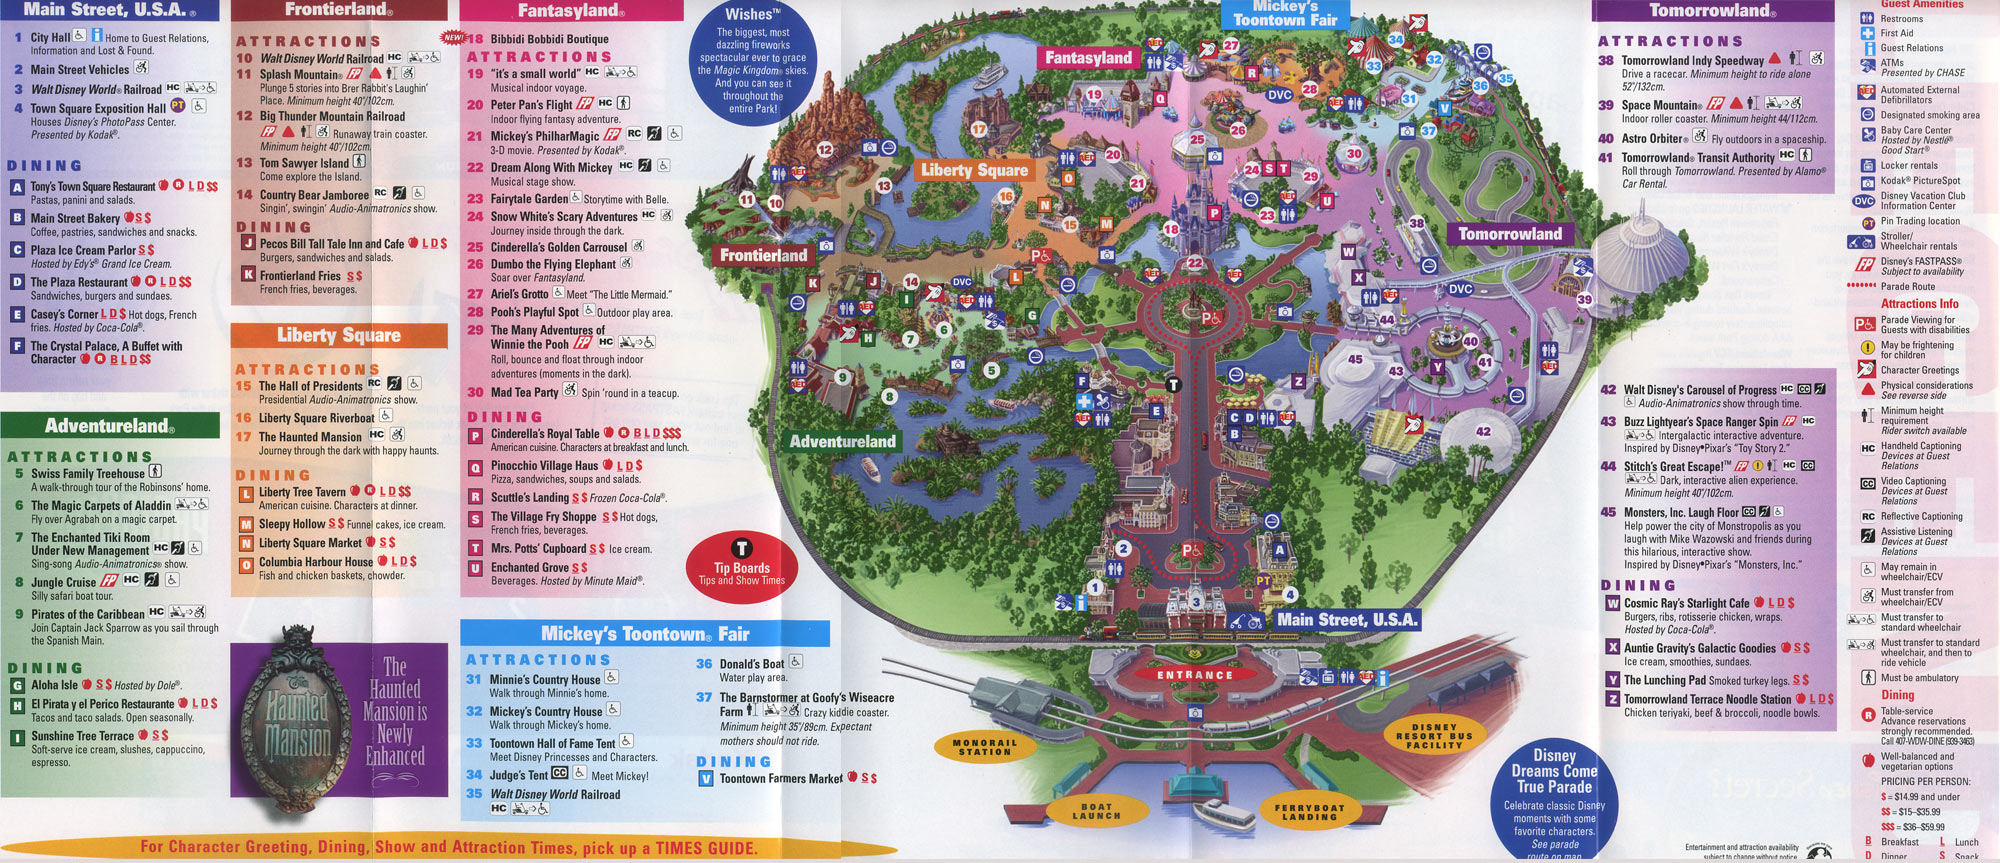 Theme Park Brochures Walt Disney World Magic Kingdom - Theme Park - Map Of Magic Kingdom Orlando Florida